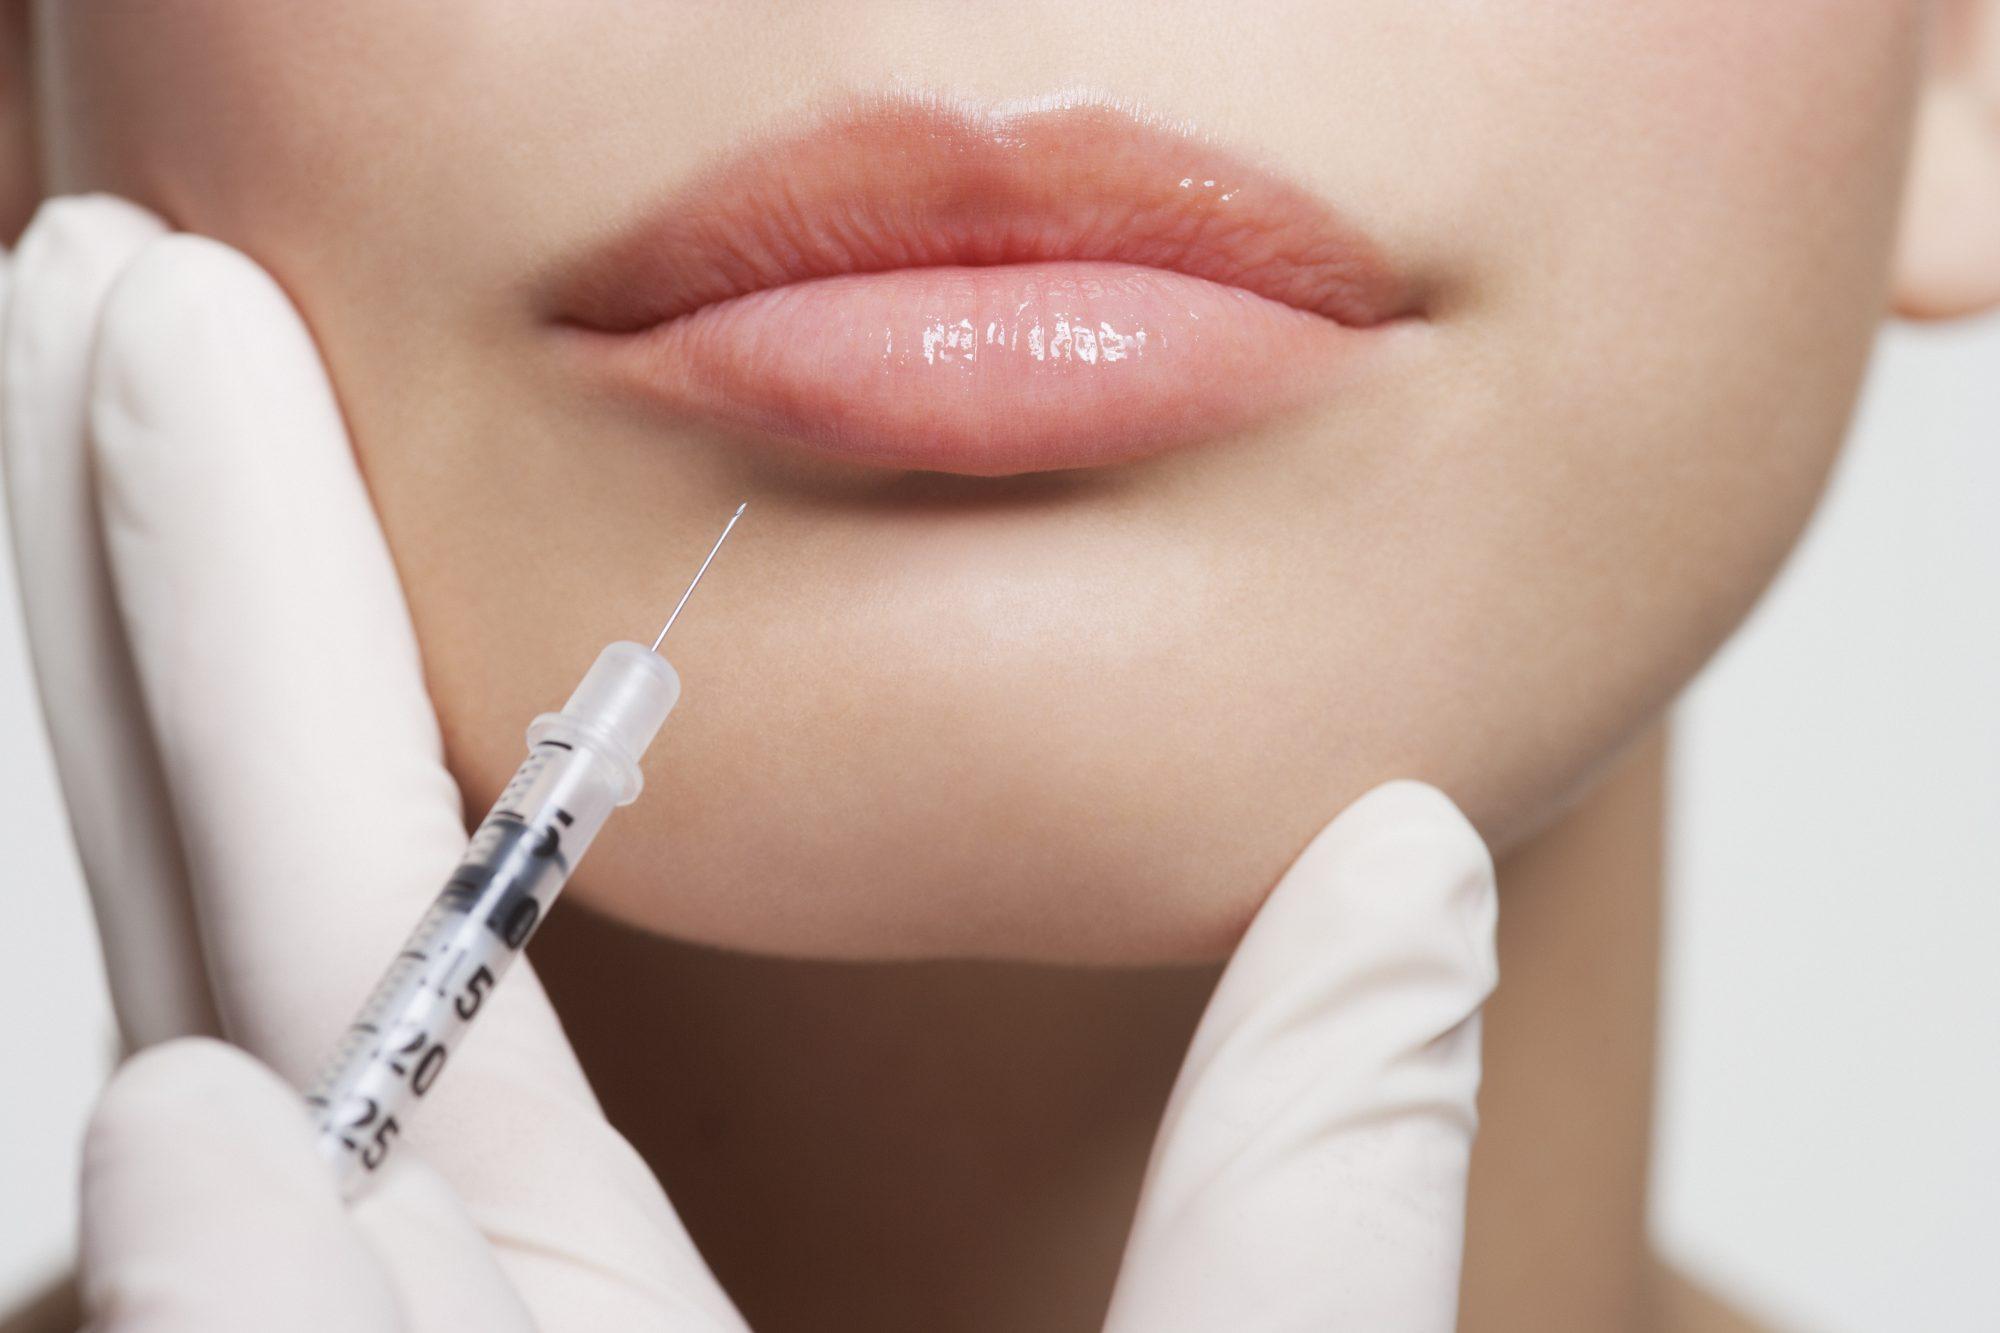 cosmetic infidelity botox fillers